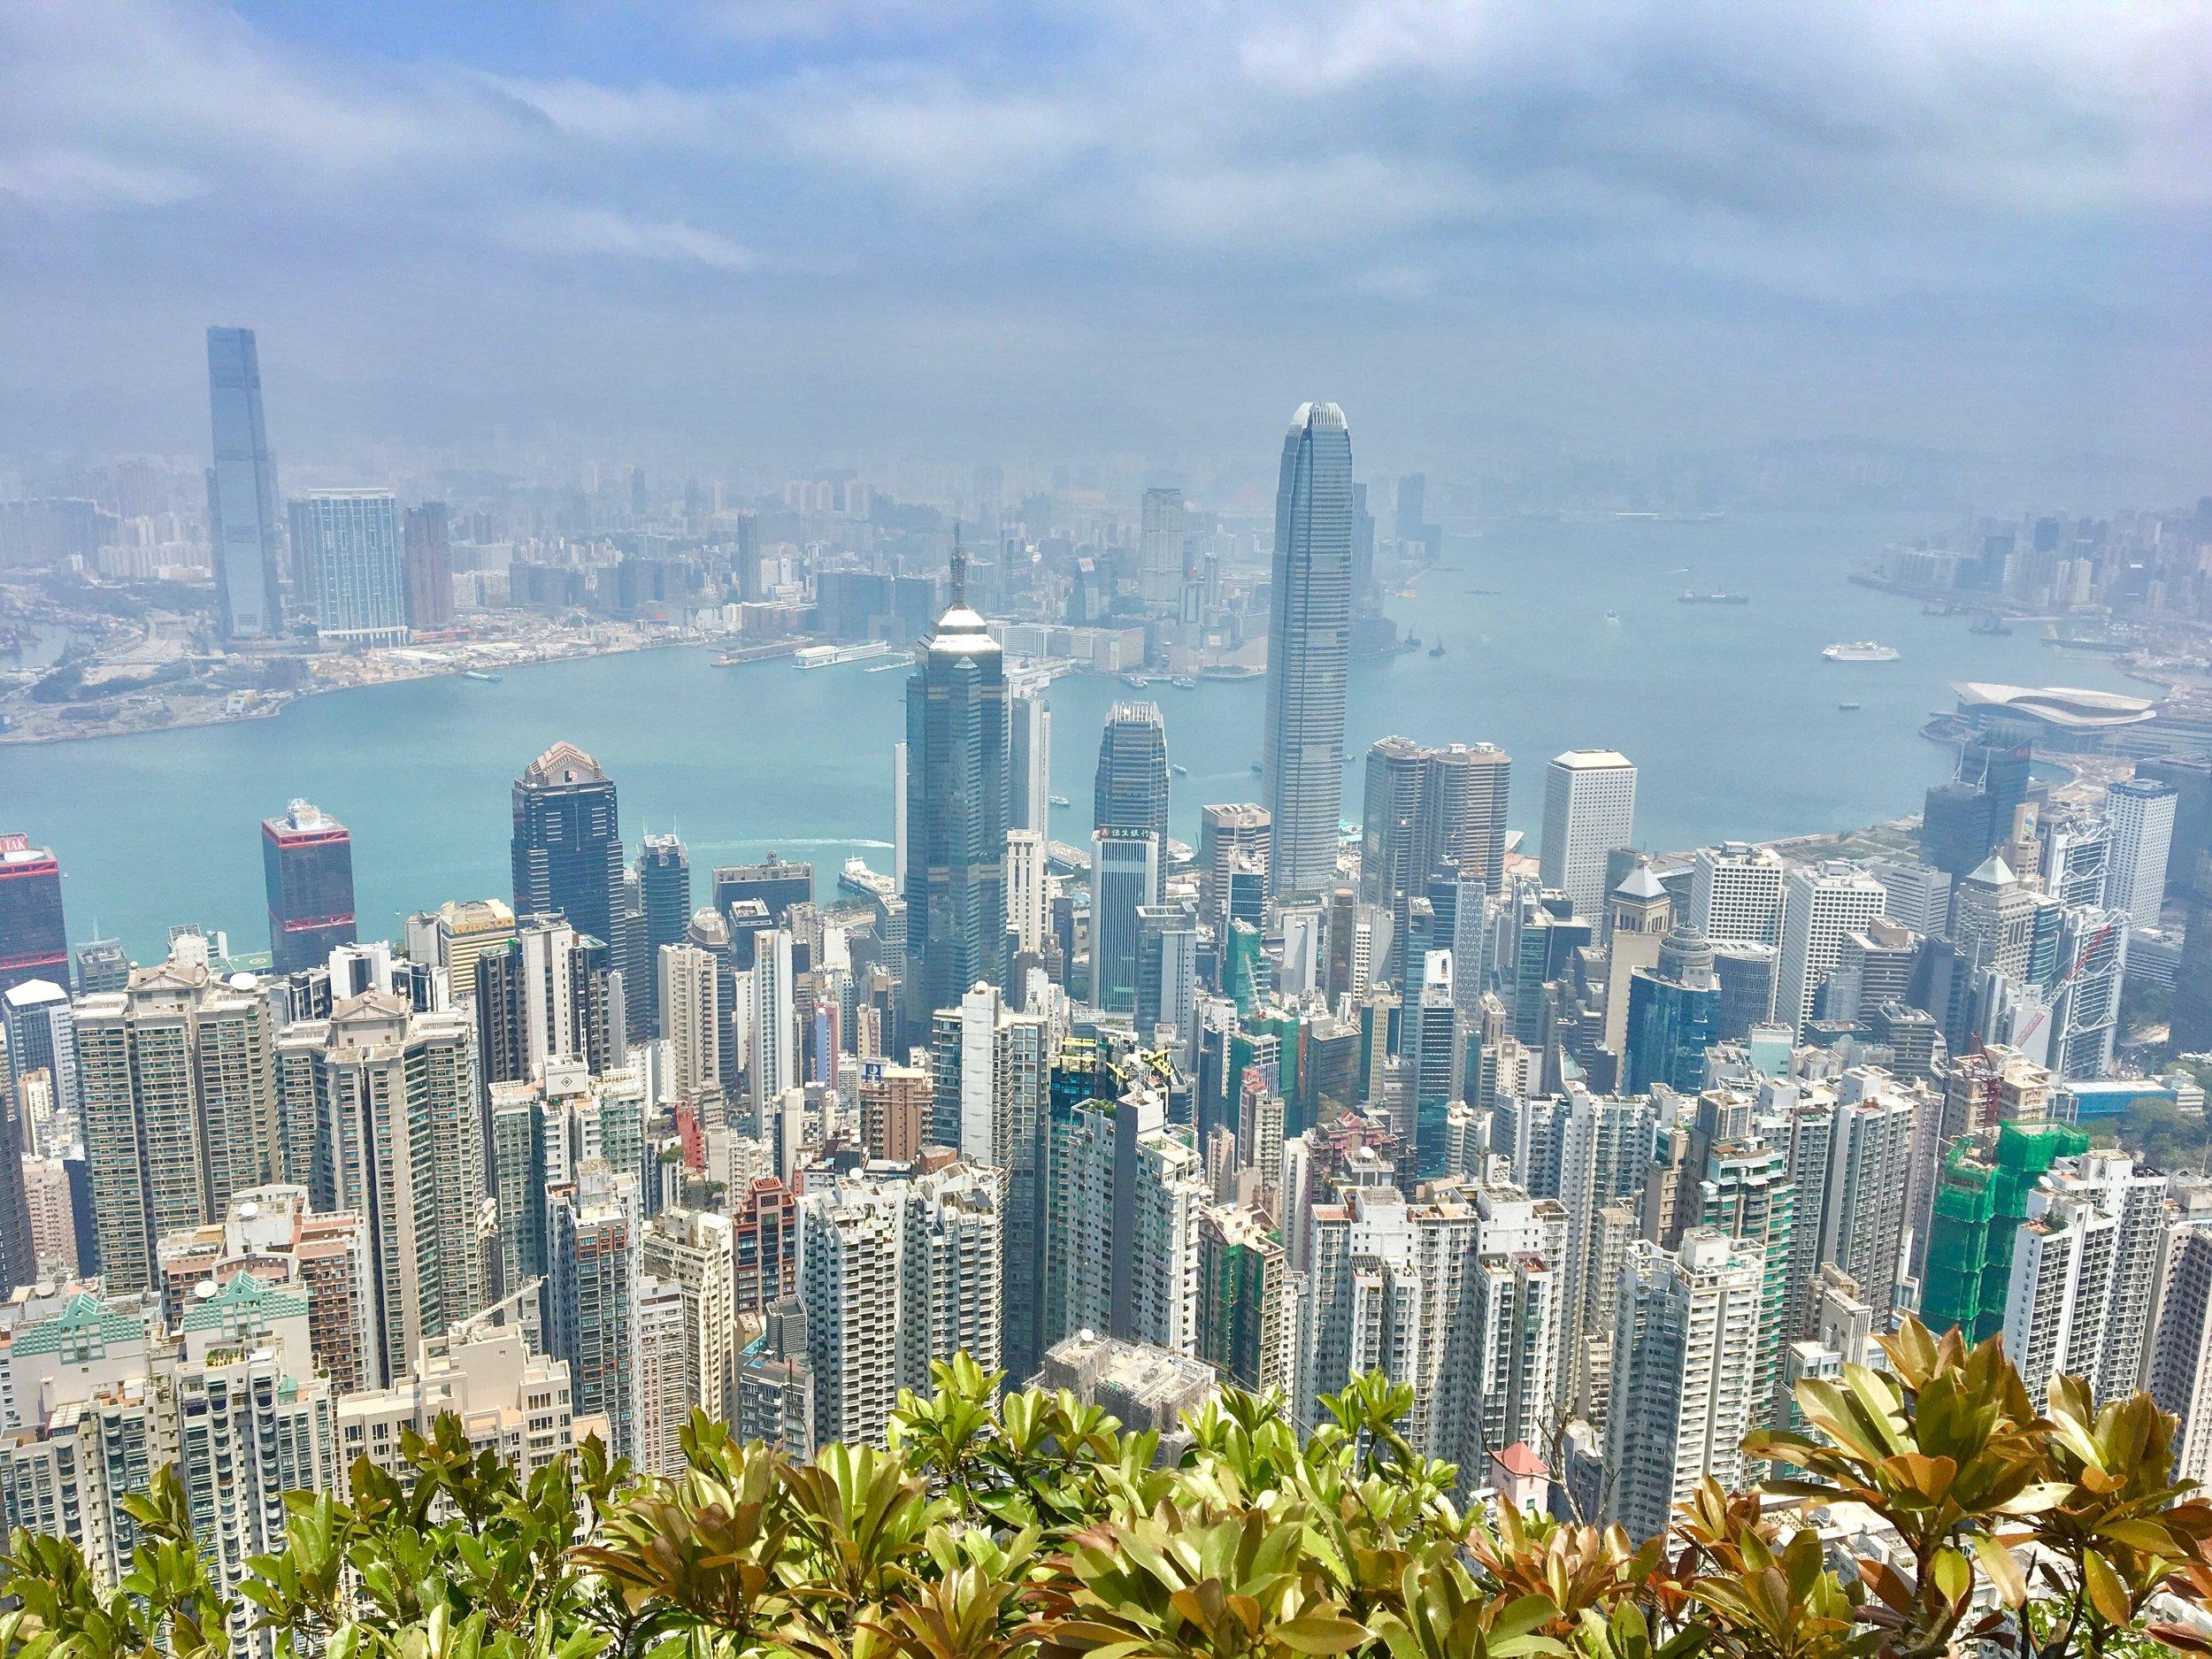 City Vista From The Peak